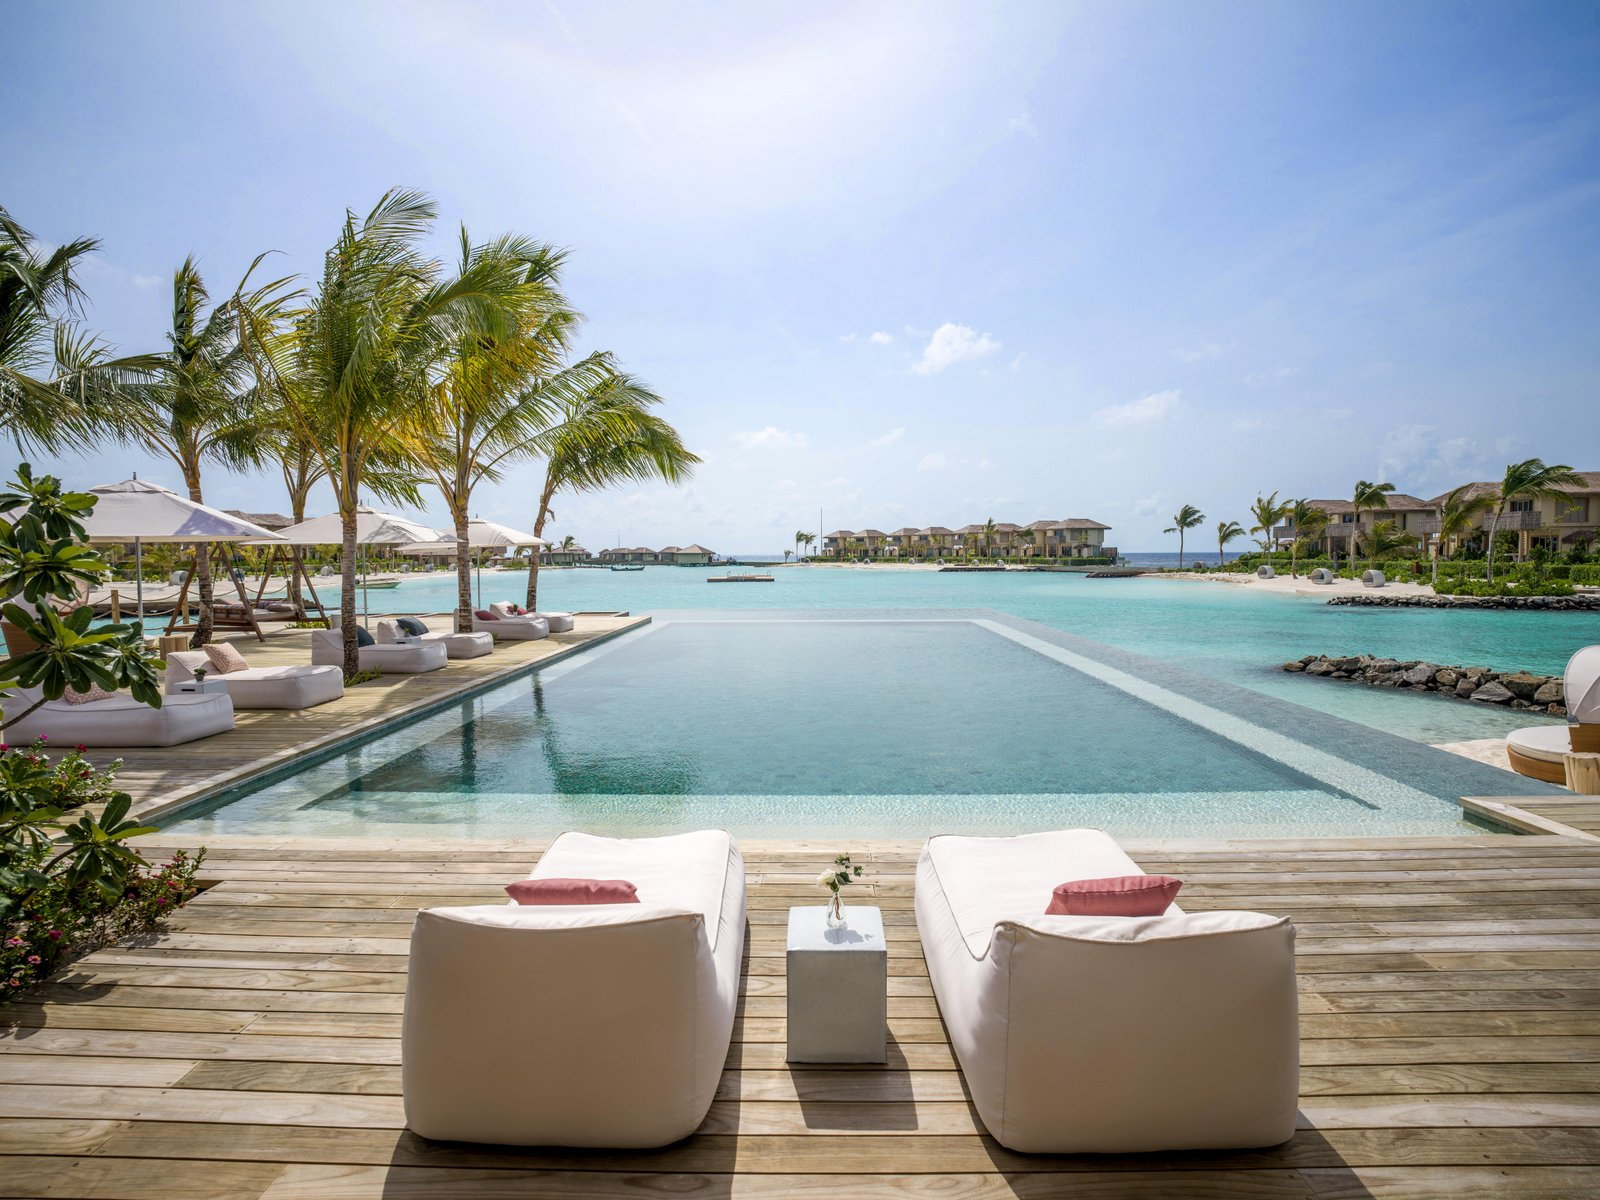 Мальдивы, отель Intercontinental Maldives Maamunagau, бар The Retreat